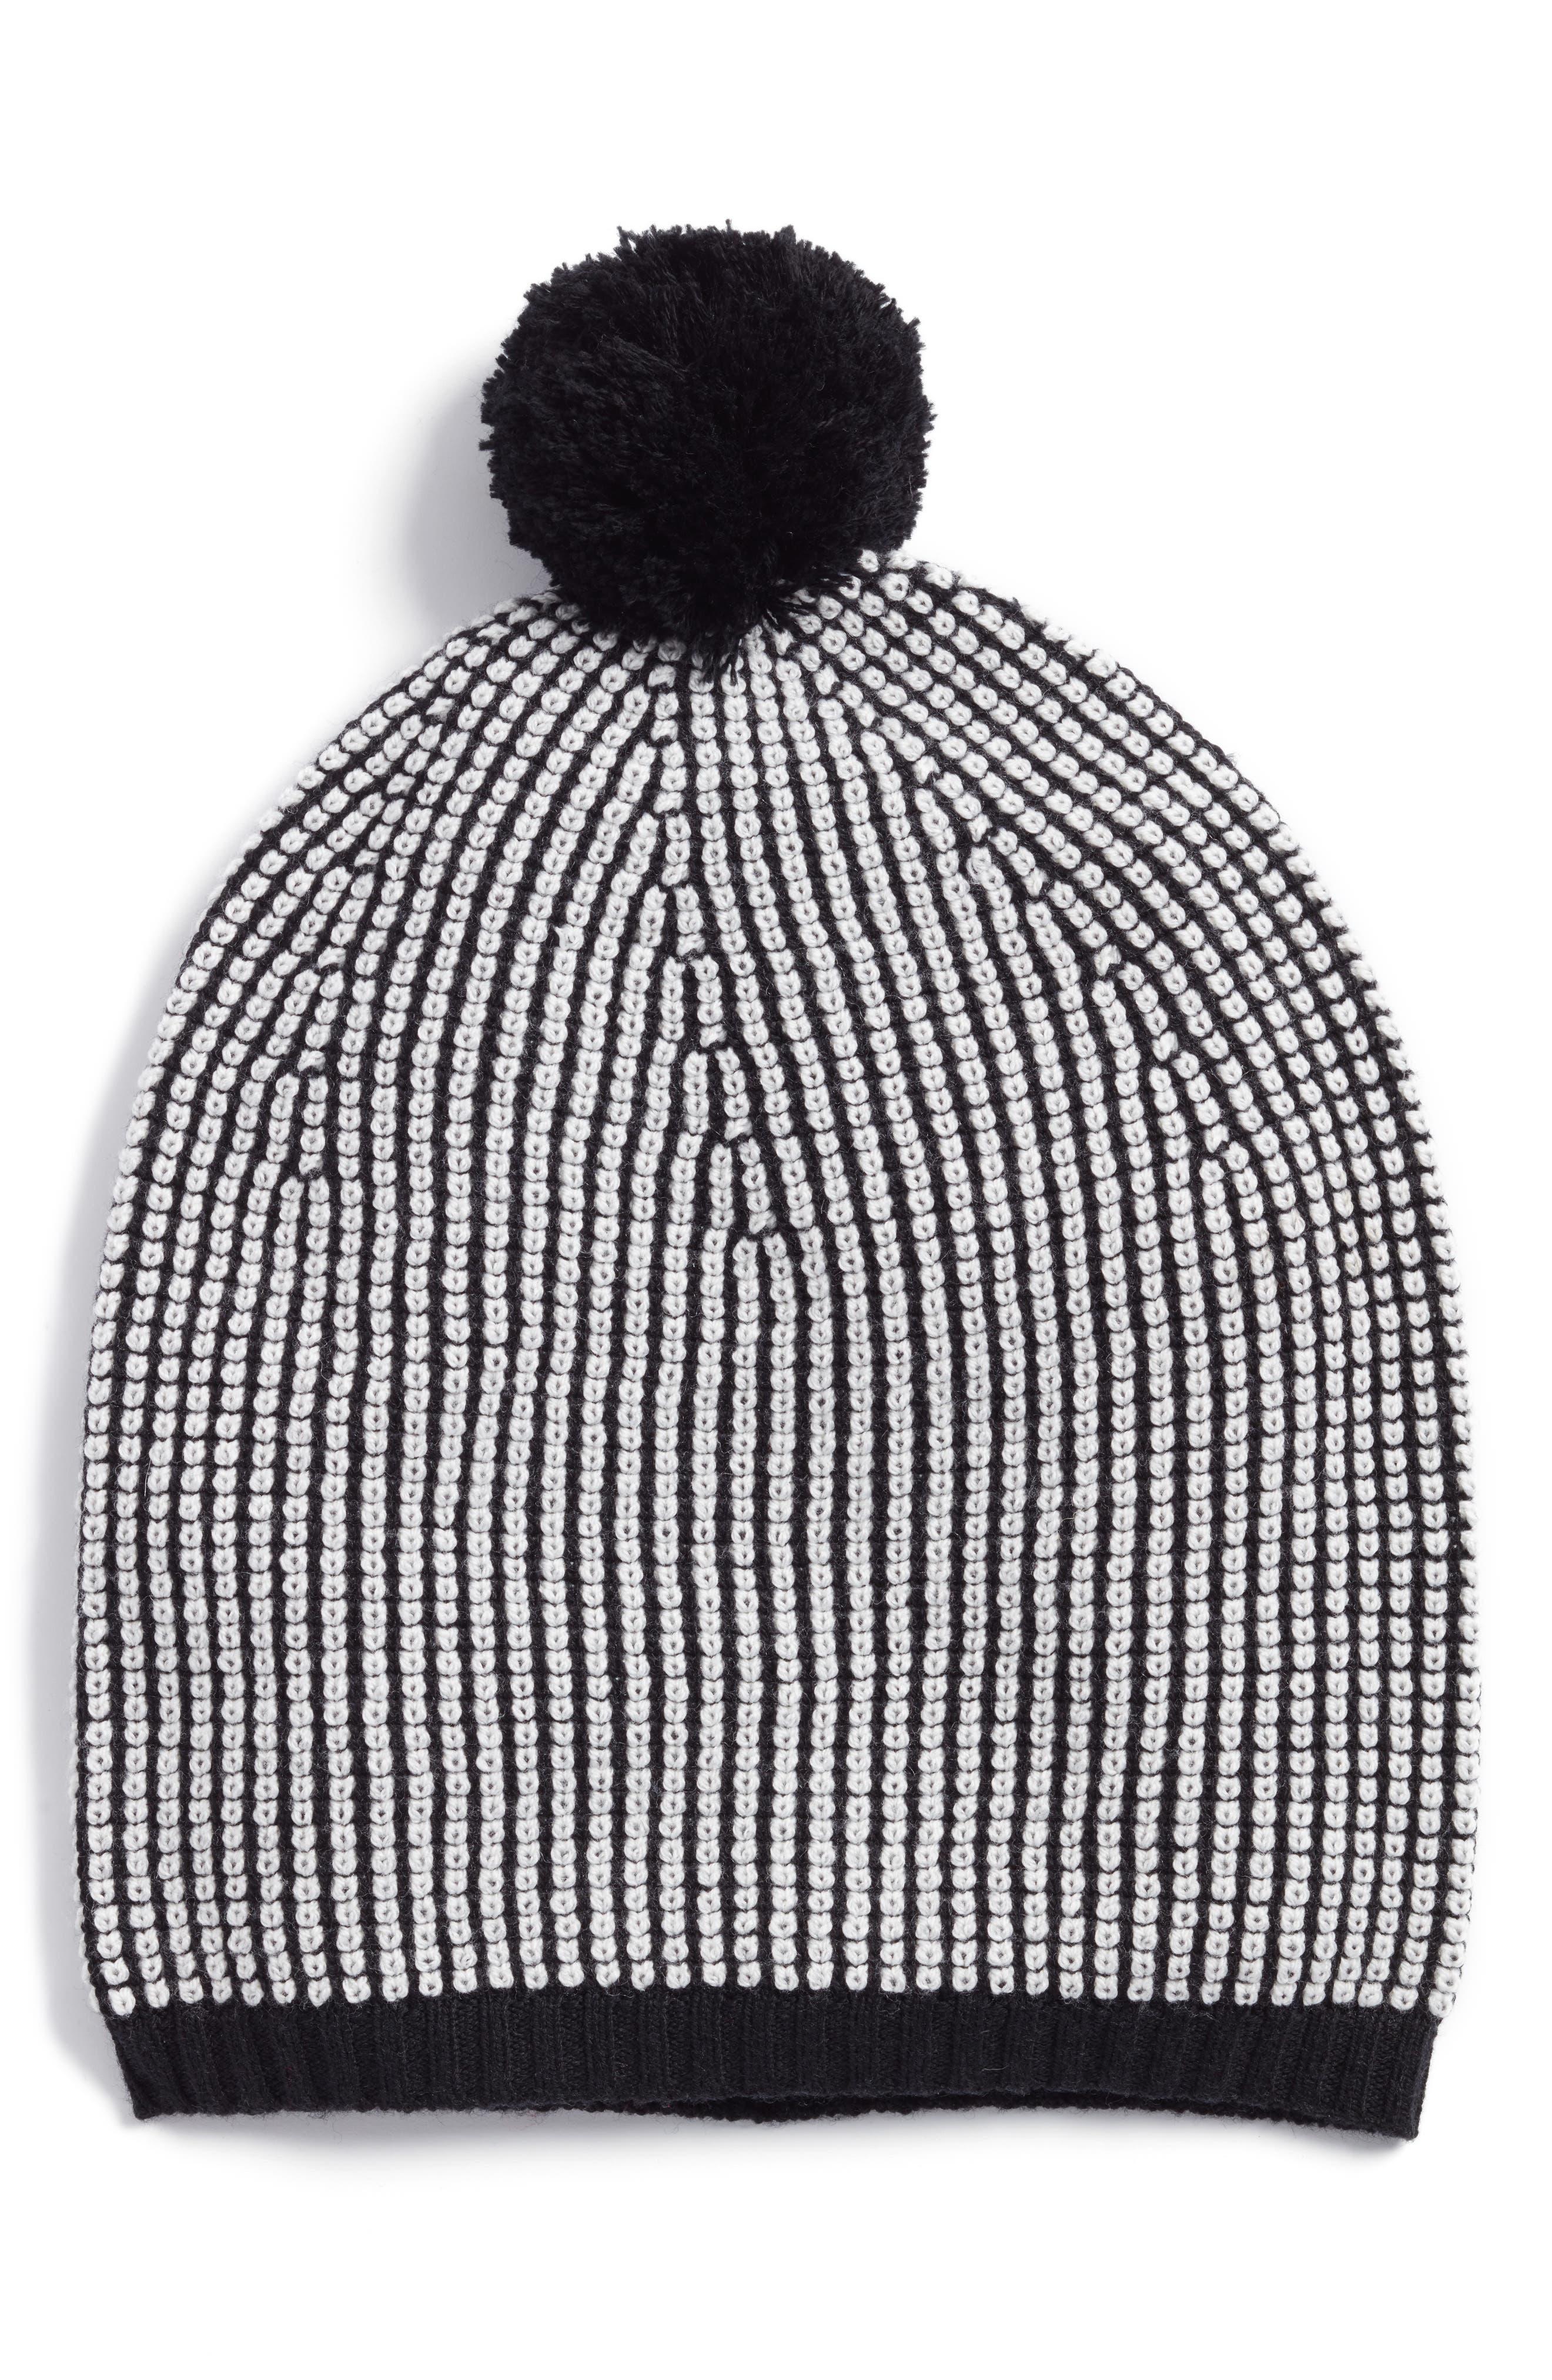 Stripe Merino Wool Beanie,                             Main thumbnail 1, color,                             Black/ Soft White